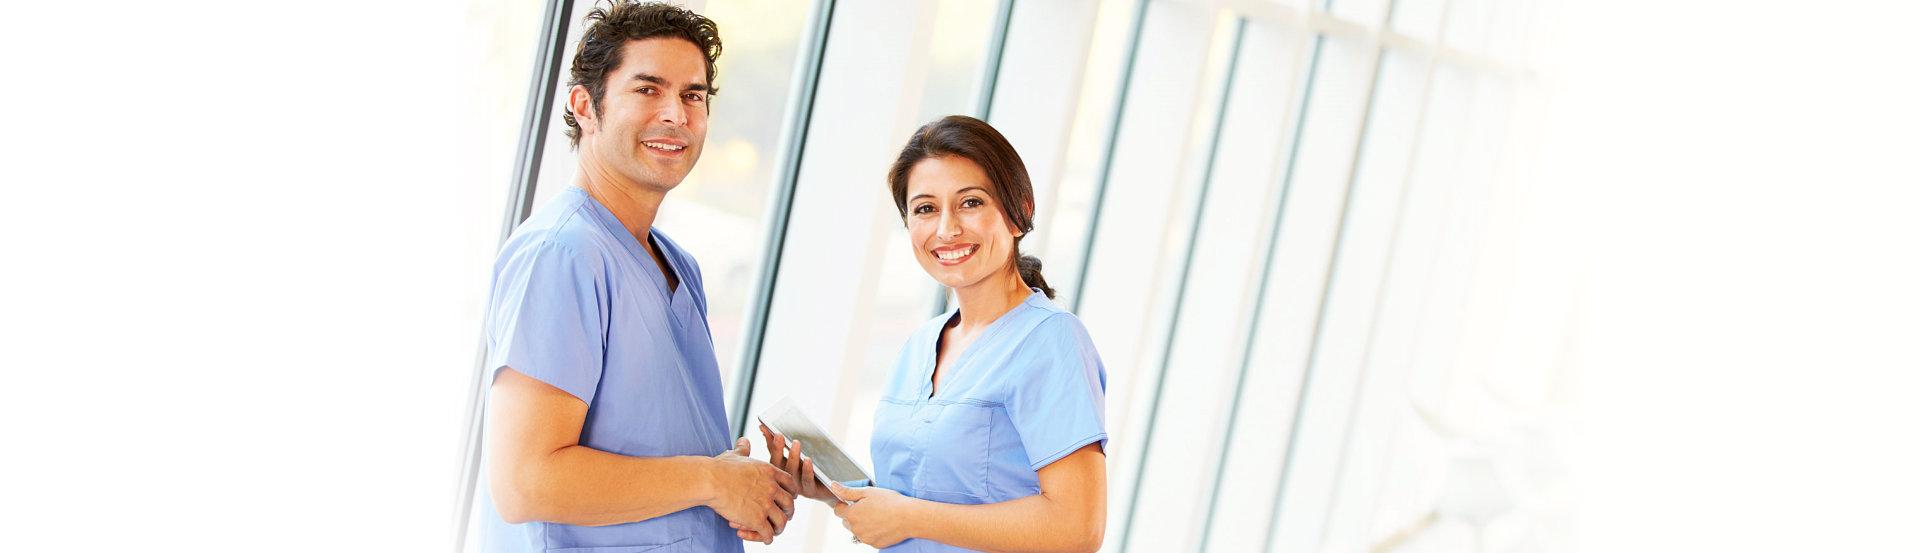 portrait of two nurses smiling through the camera